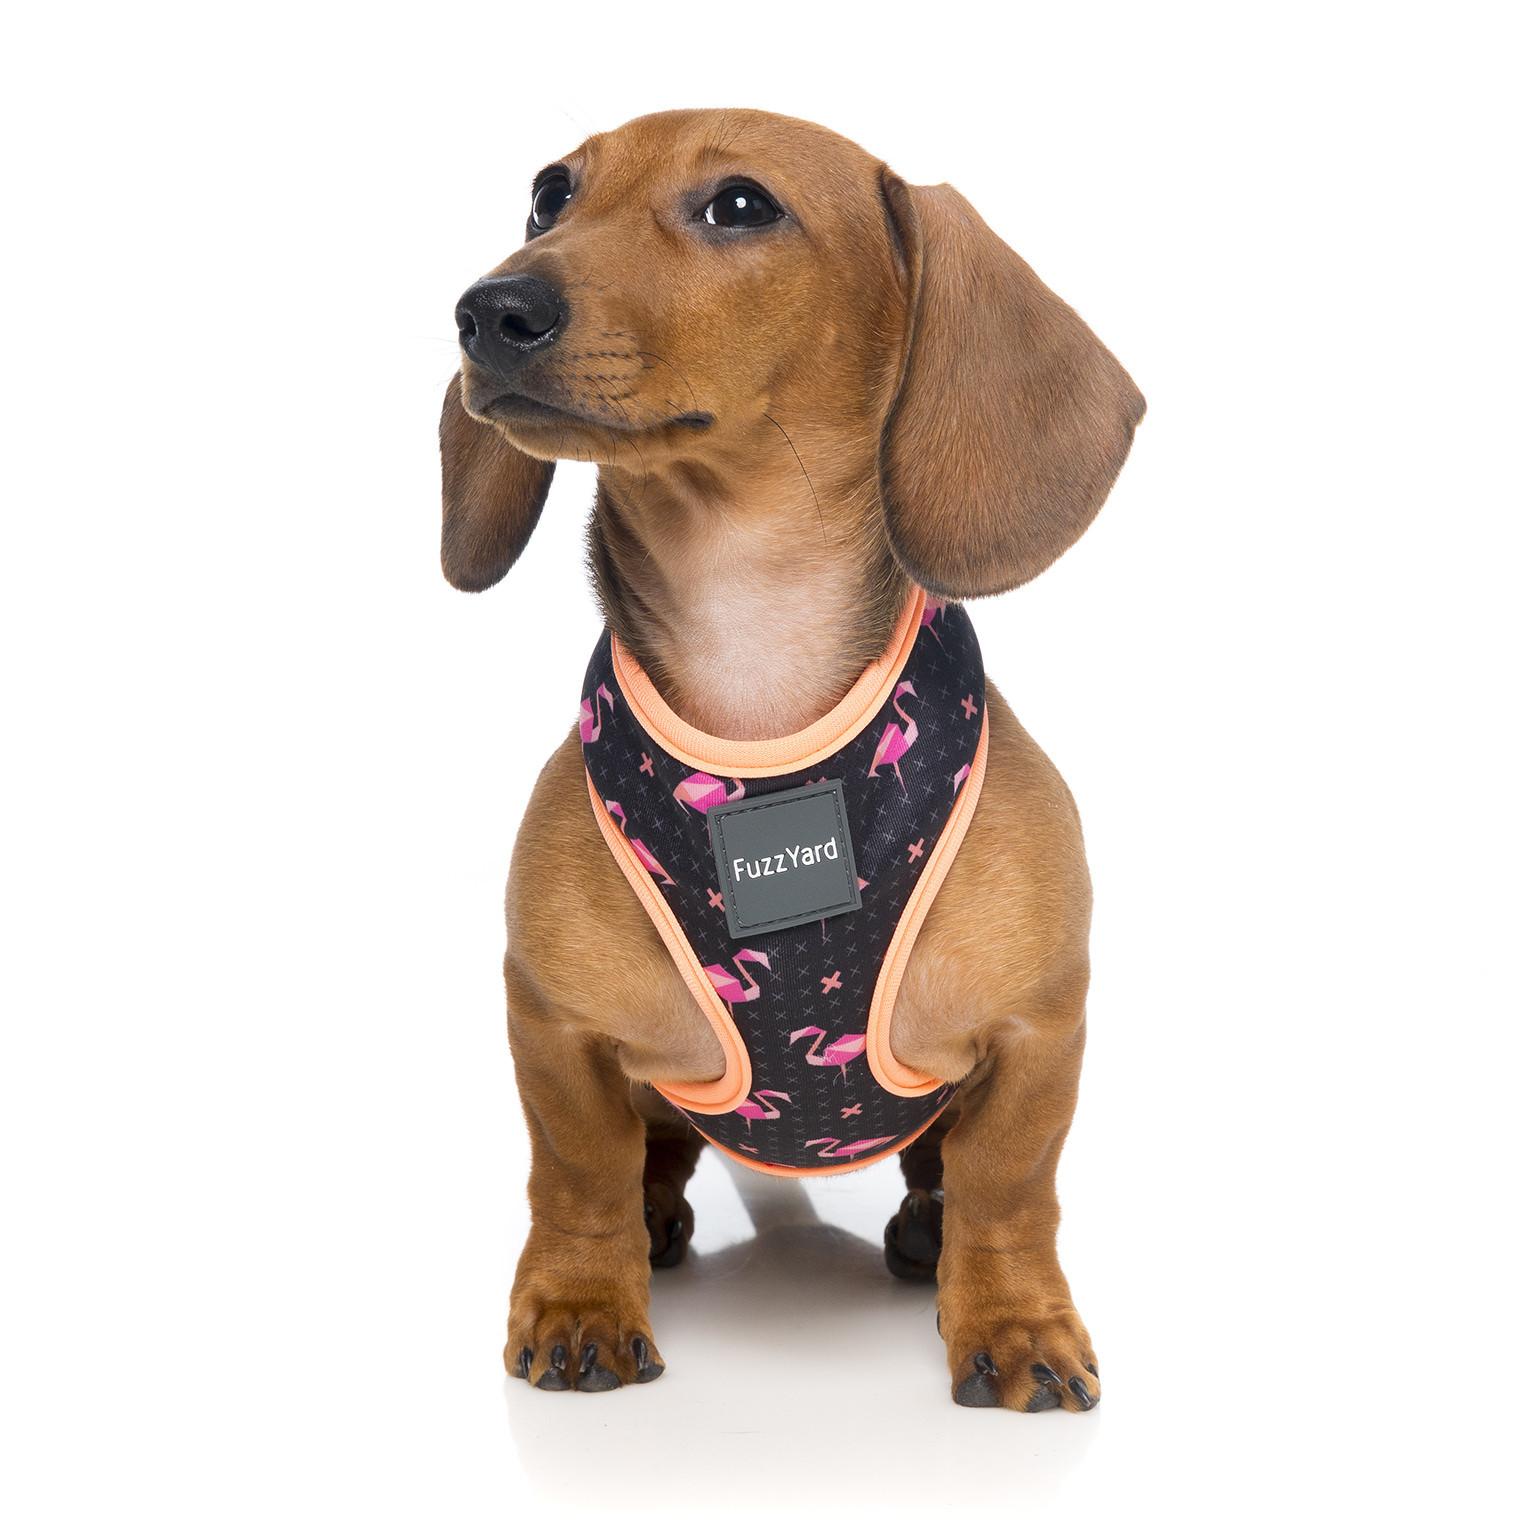 fuzzyard-harness-fabmingo-dog-1.jpg